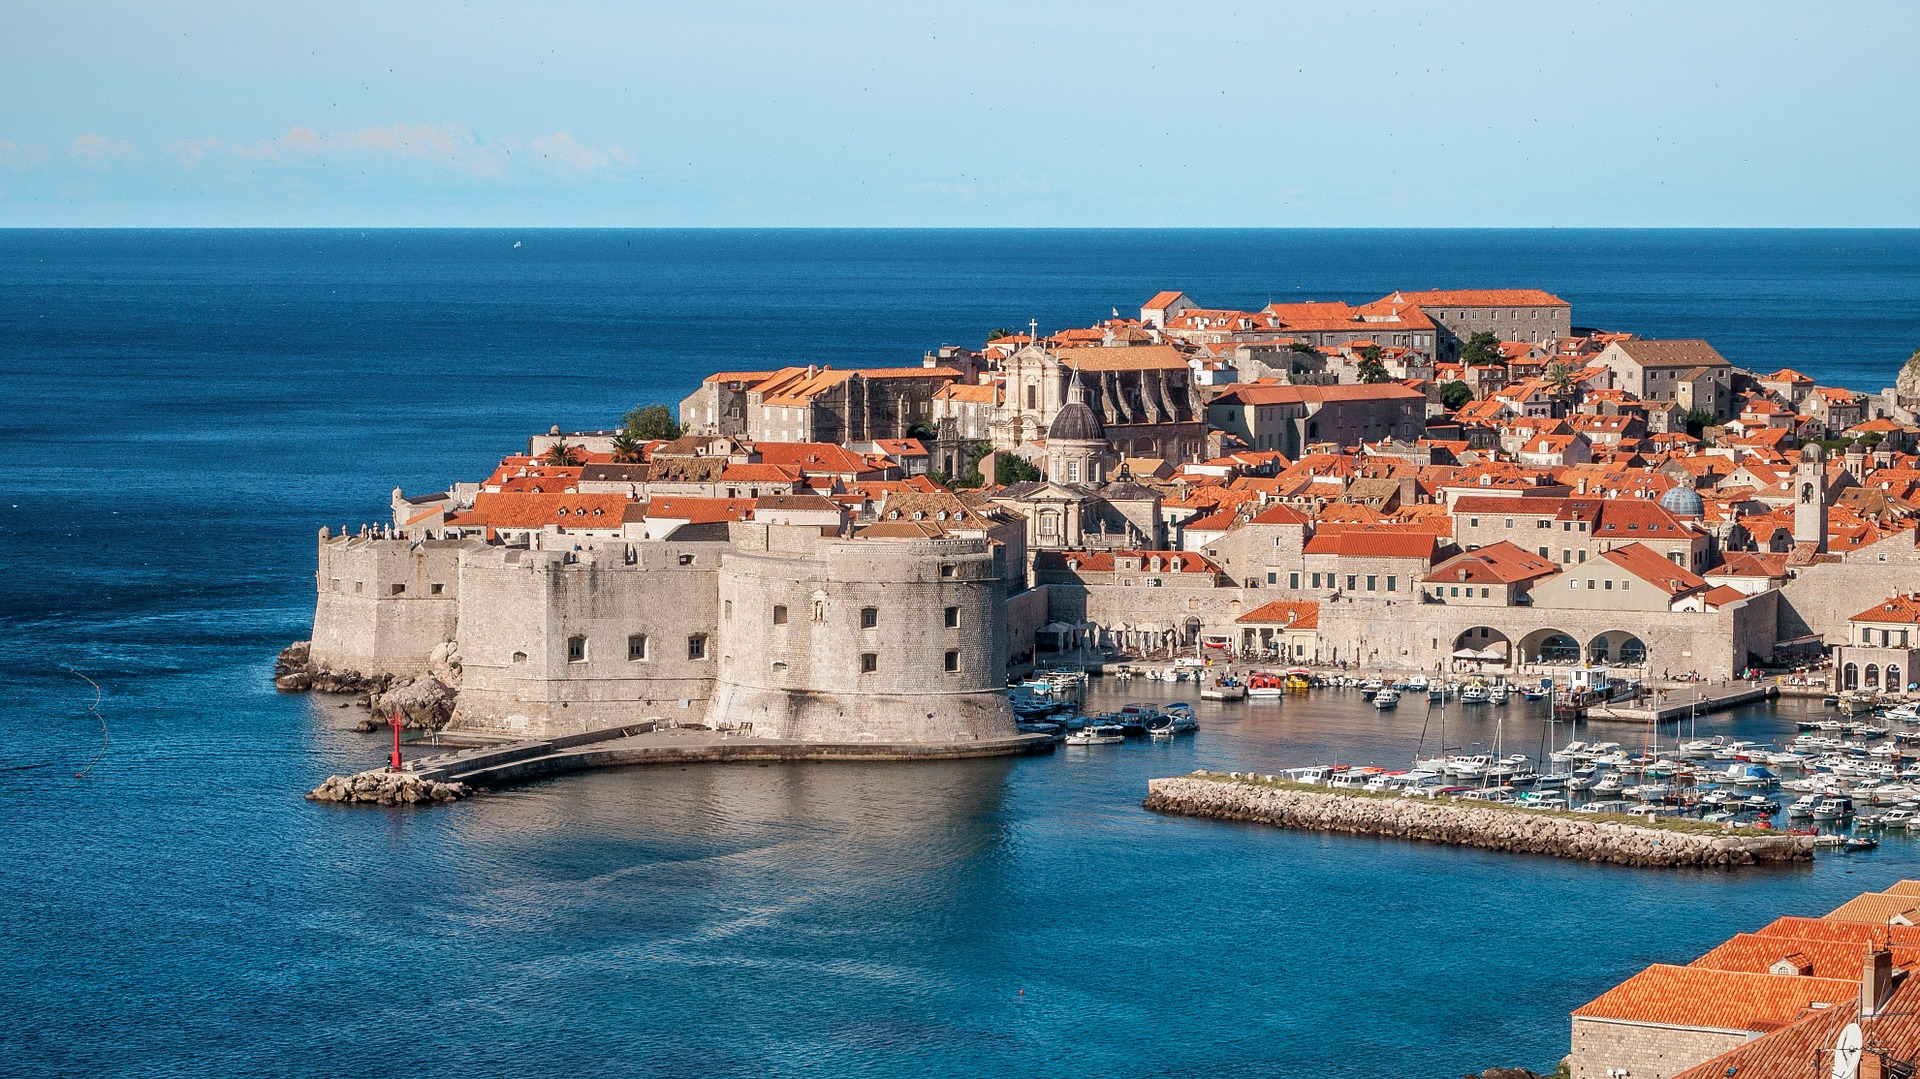 Overview of Dubrovnik